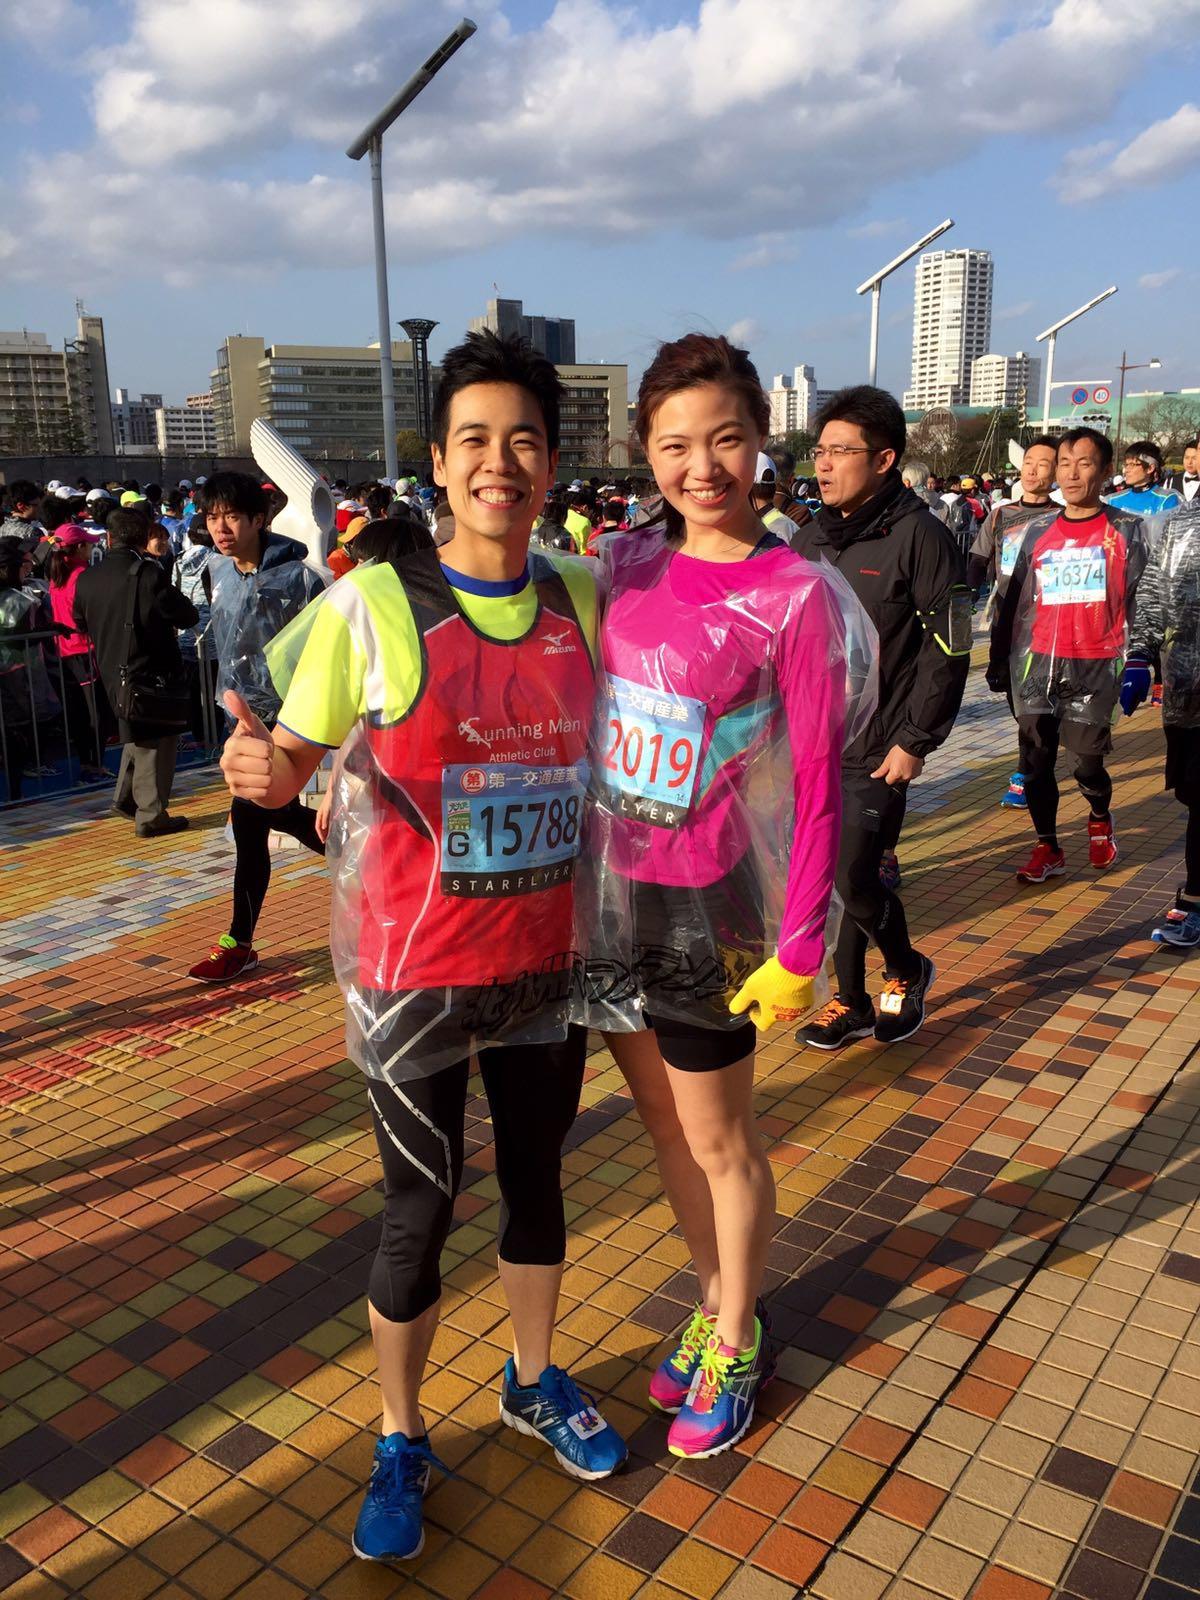 2016-03-09-PHOTO-00000194.jpg